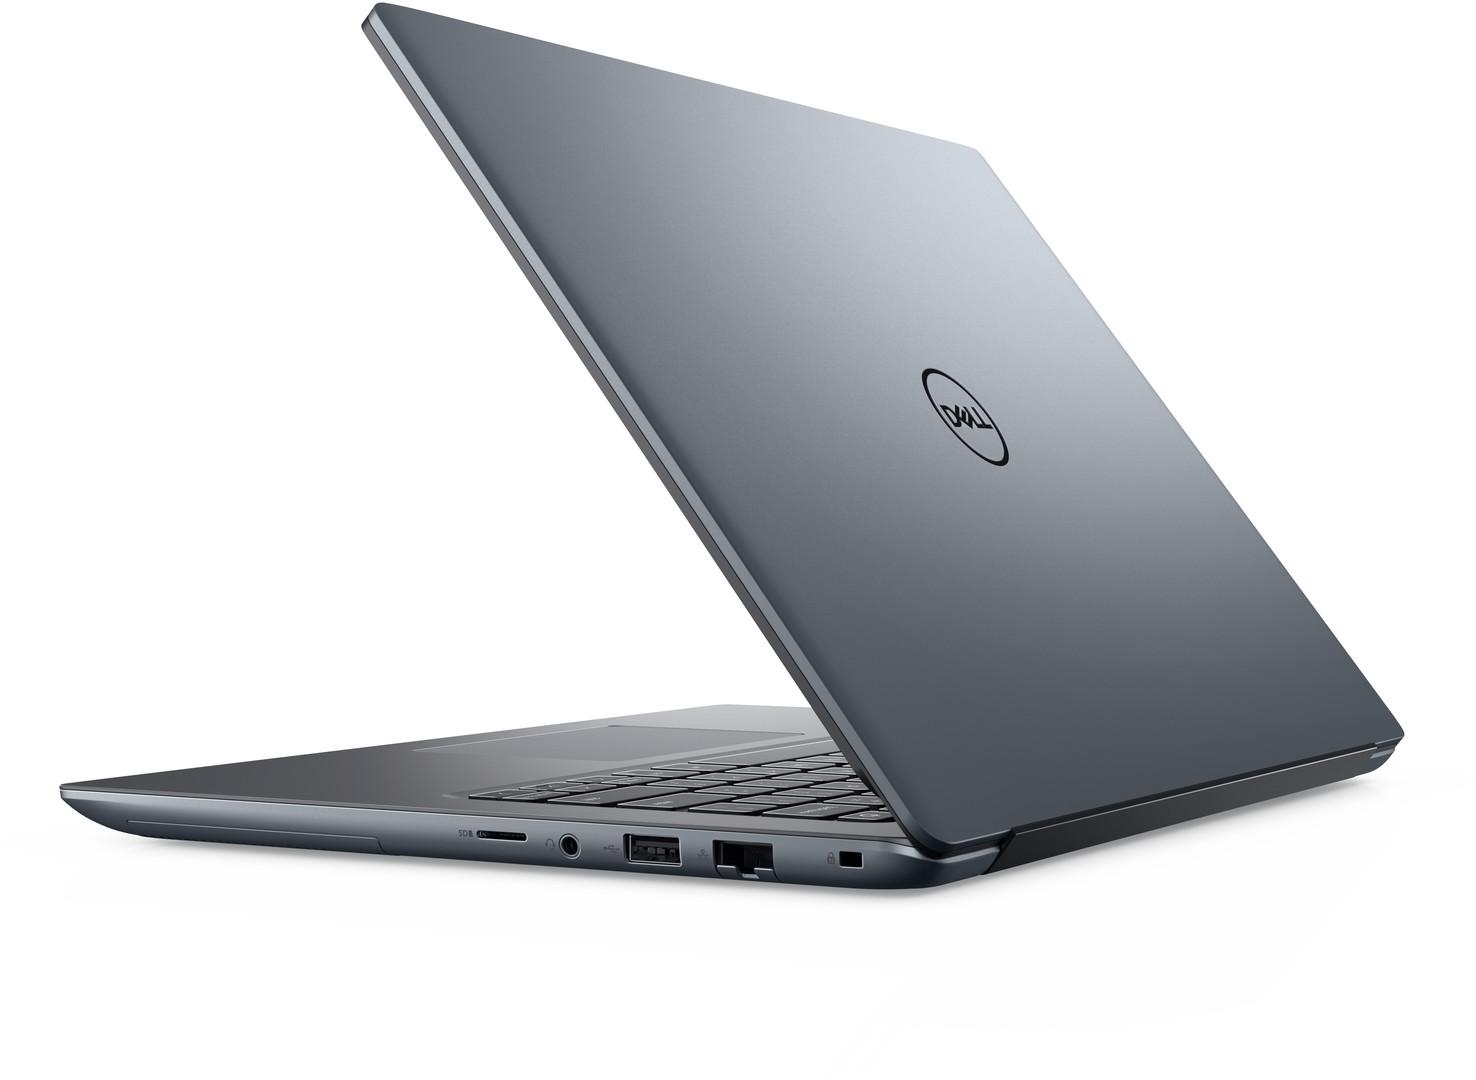 Notebook Dell Vostro 5490 Core I7 10510u Memoria 8gb Ssd 256gb Placa De Video Mx230  Tela 14' Fhd Windows 10 Home